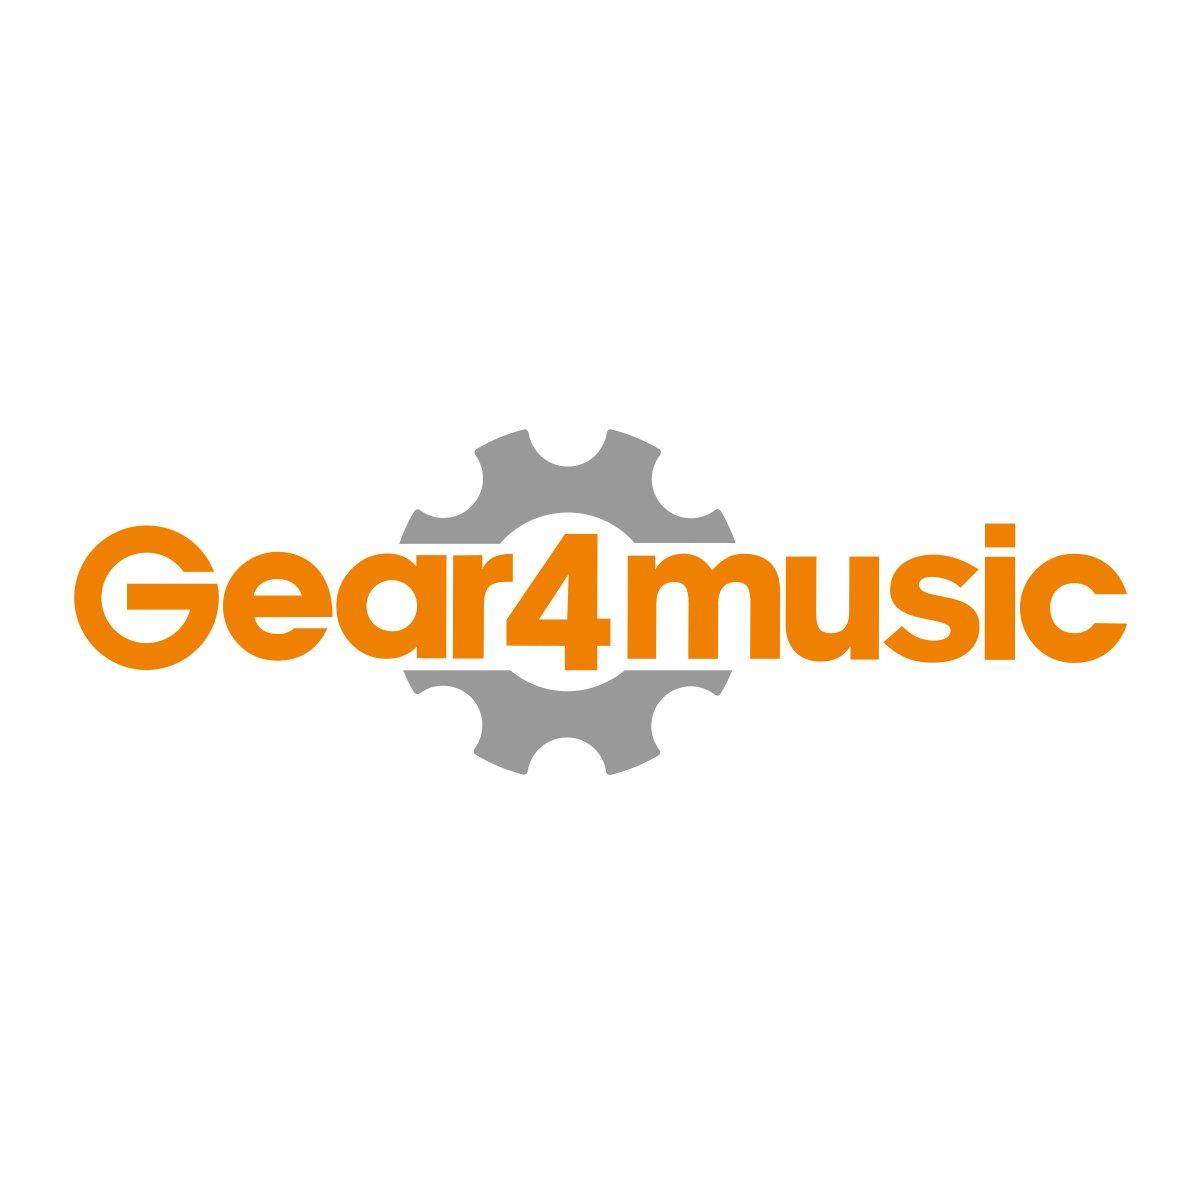 Casio - Deezer 6 months FREE subscription (UK Only)